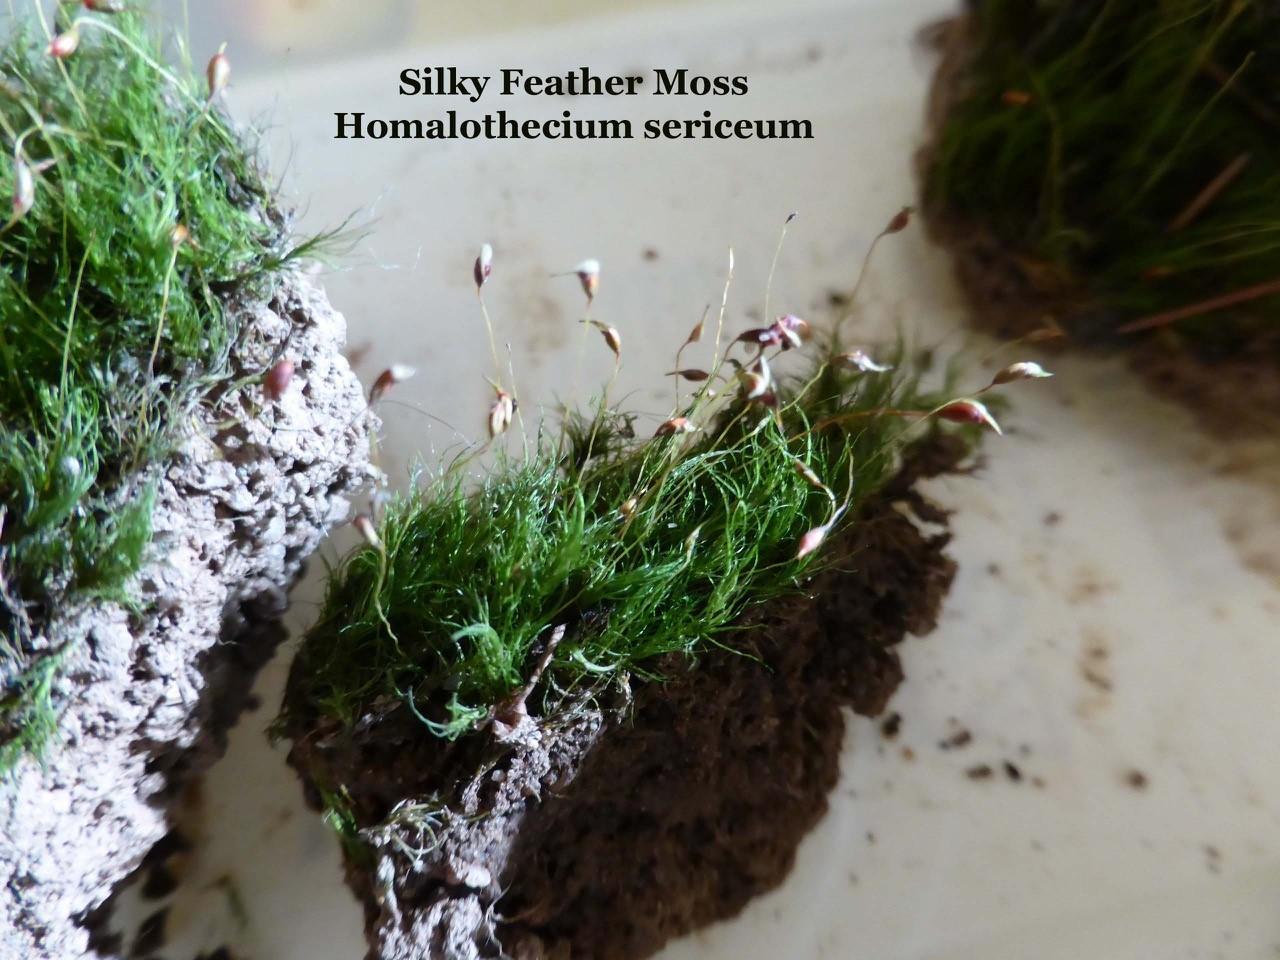 Silky Feather Moss (Homalothecium), Wentworth Garden Centre